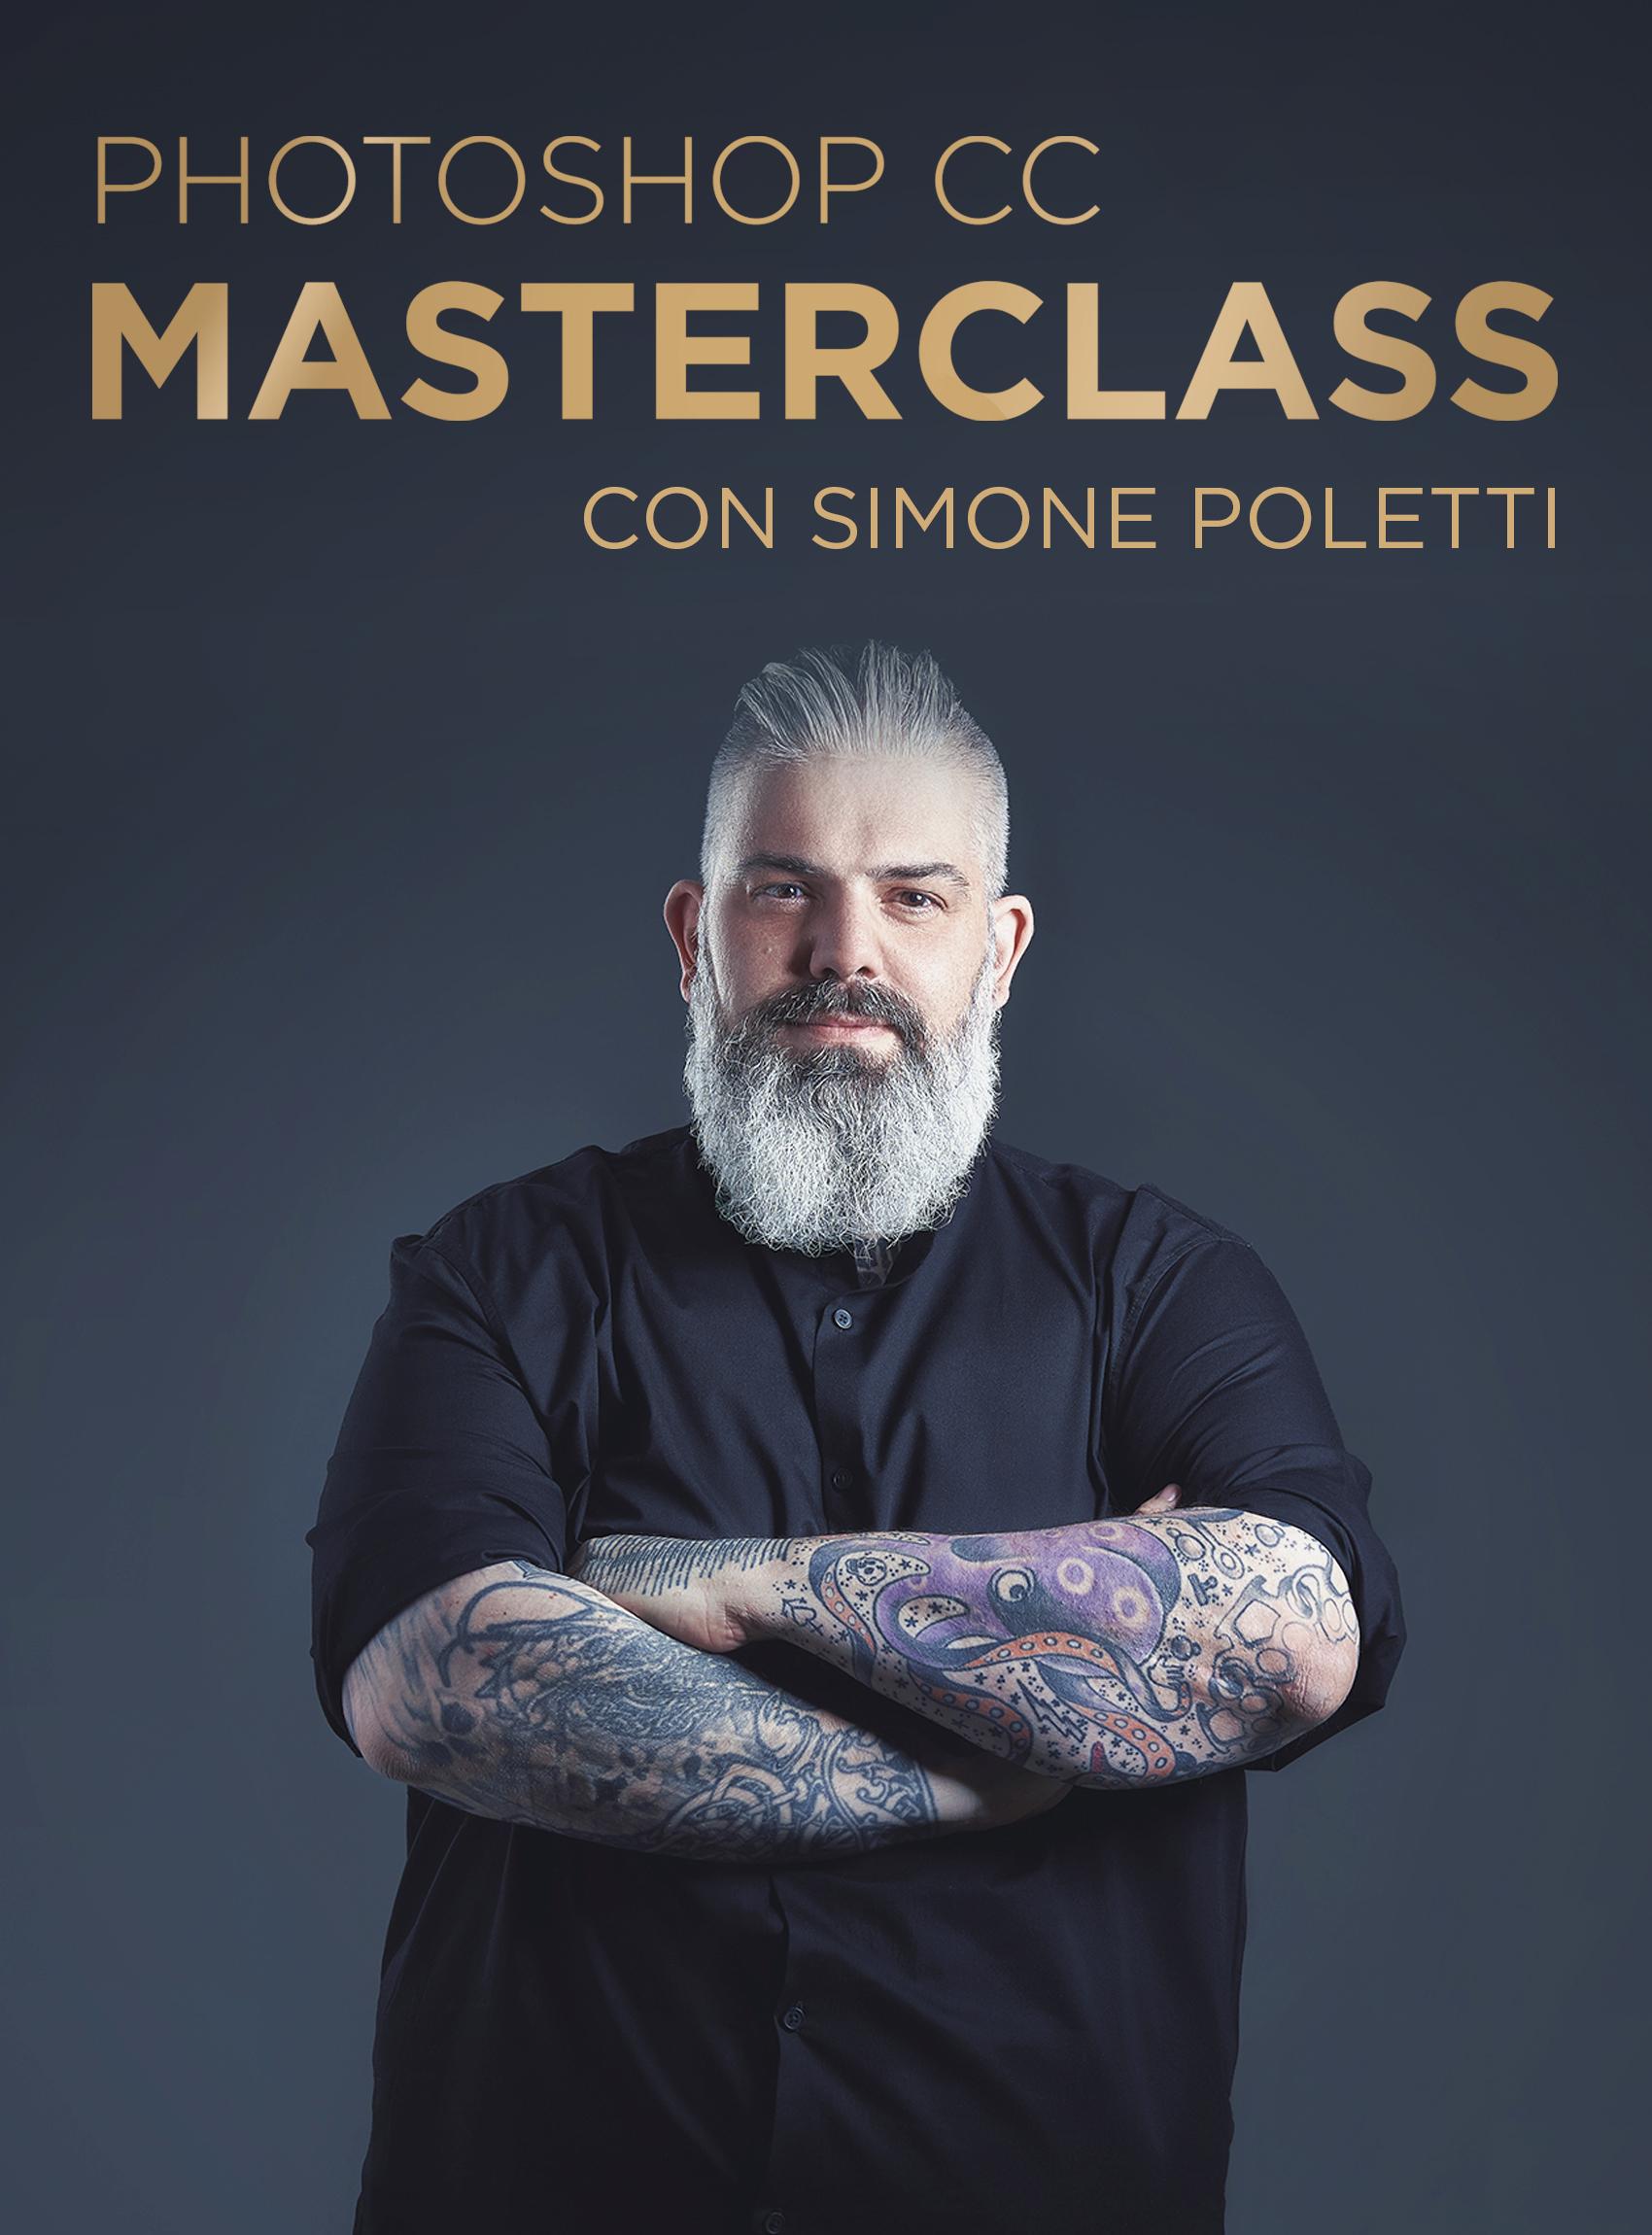 Photoshop CC Masterclass